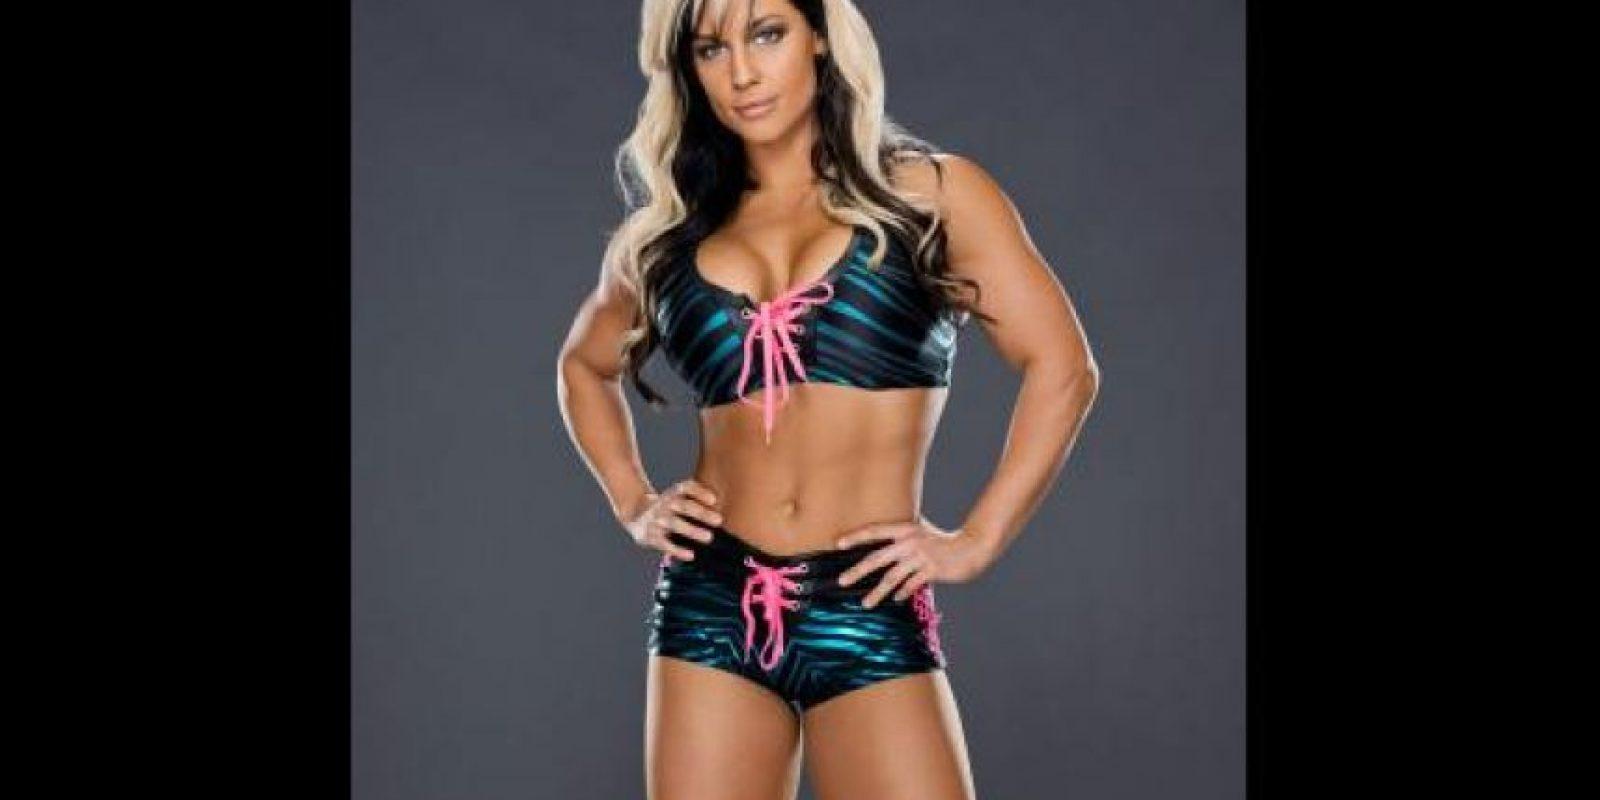 Lanzó su propia empresa de ropa fitness llamada Celestial Bodiez Foto:WWE